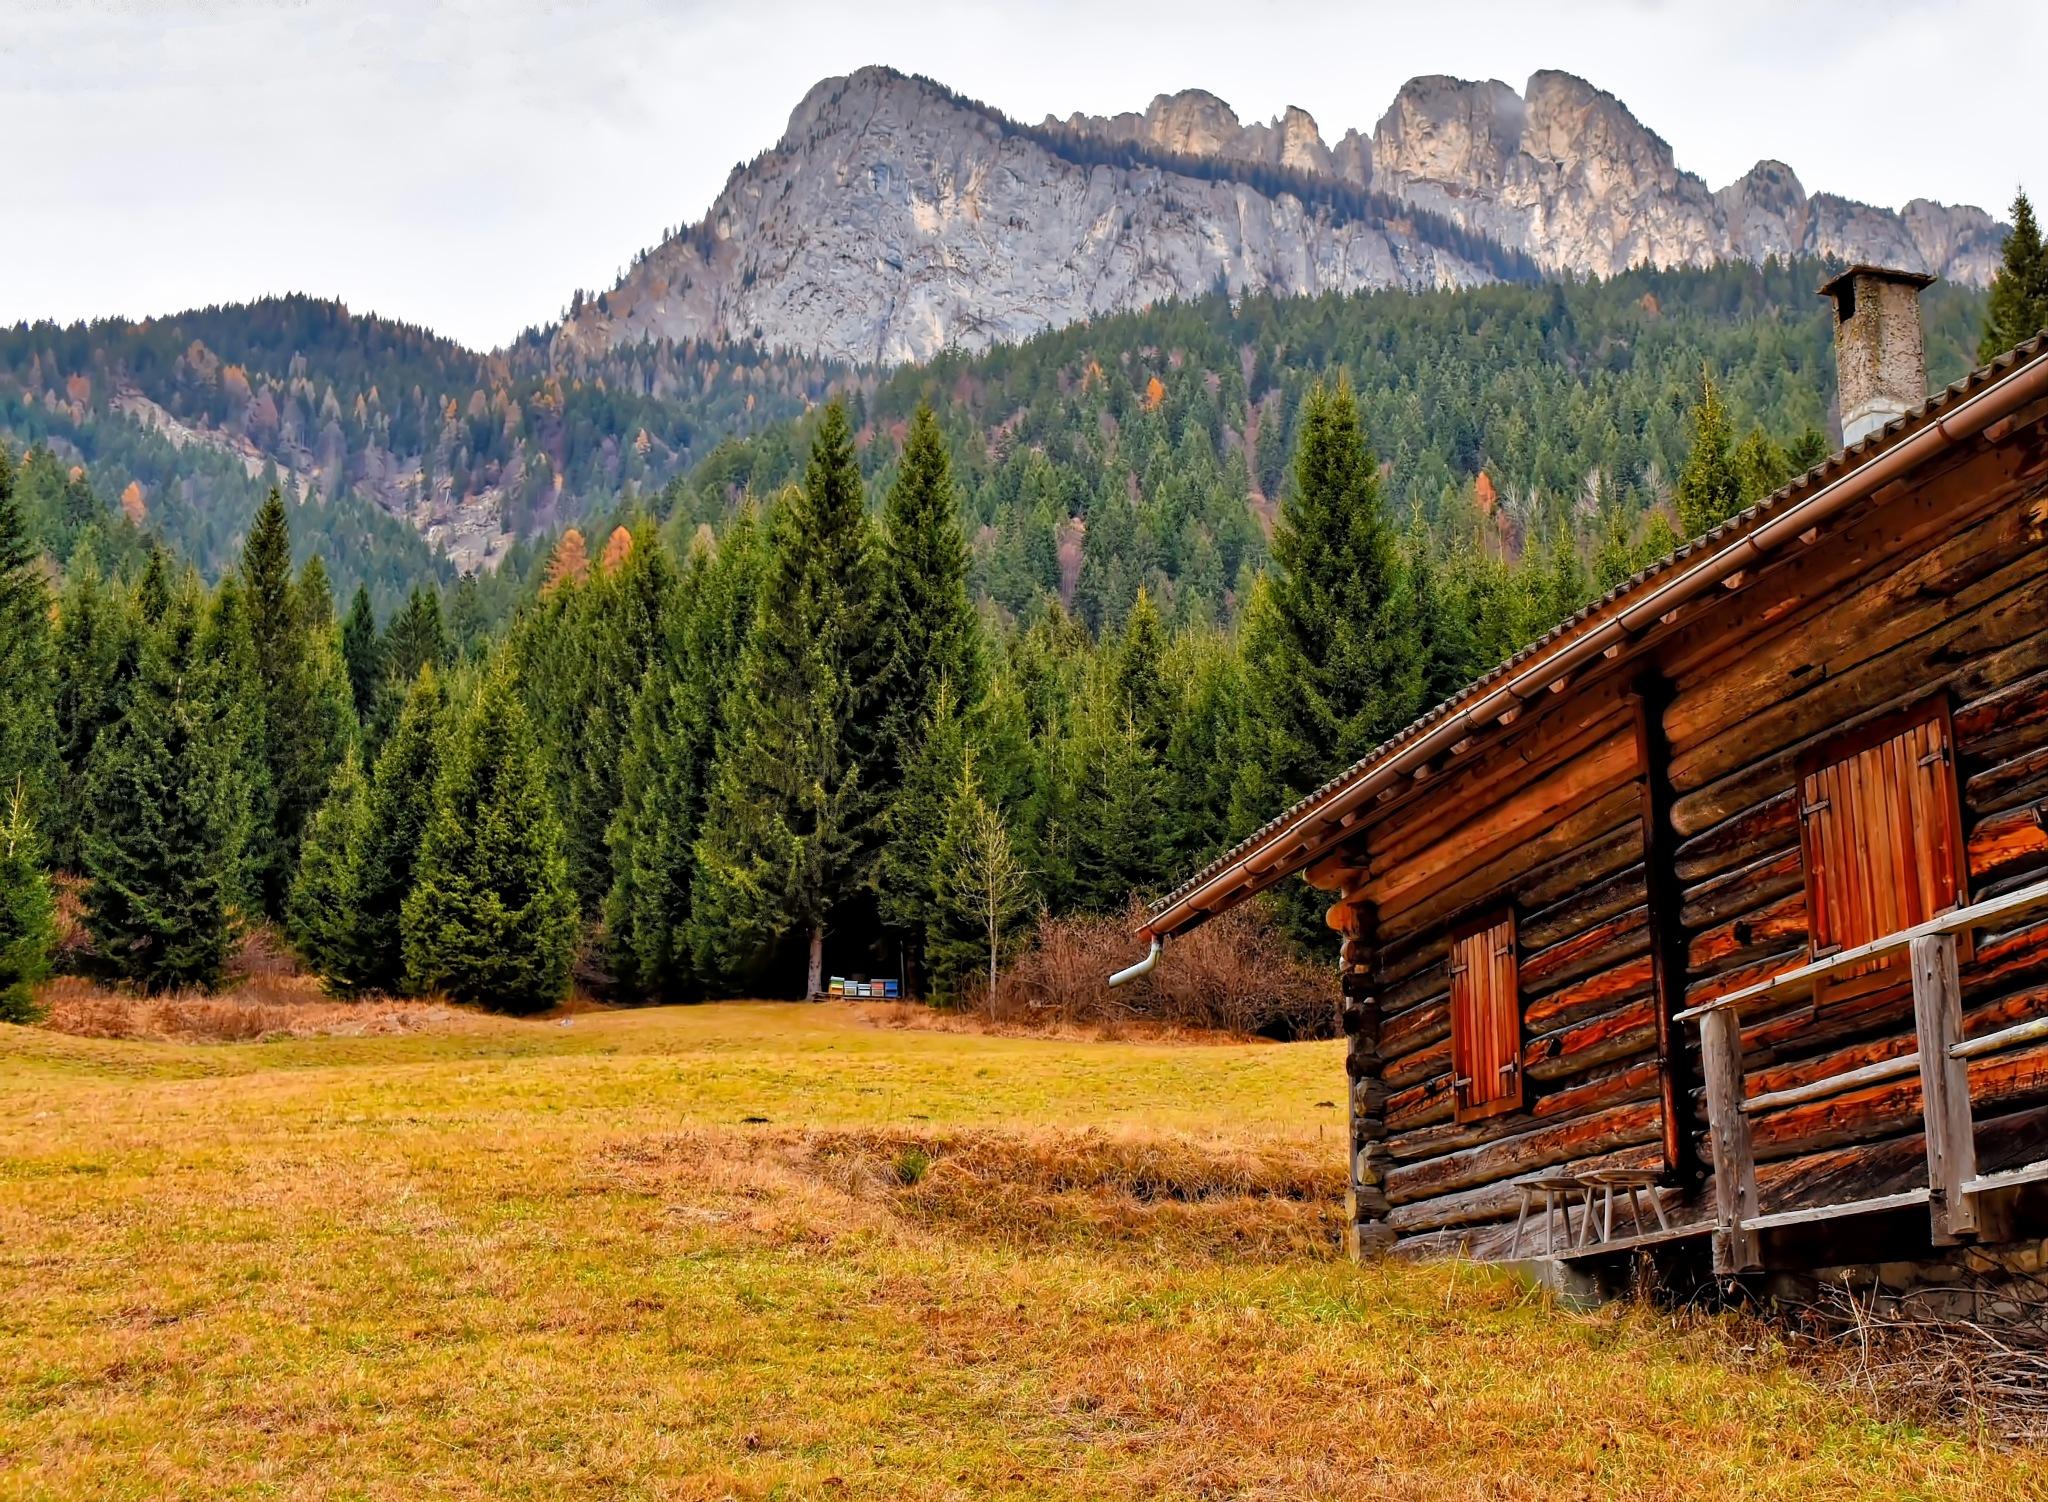 Mountain Cabin by Mirto